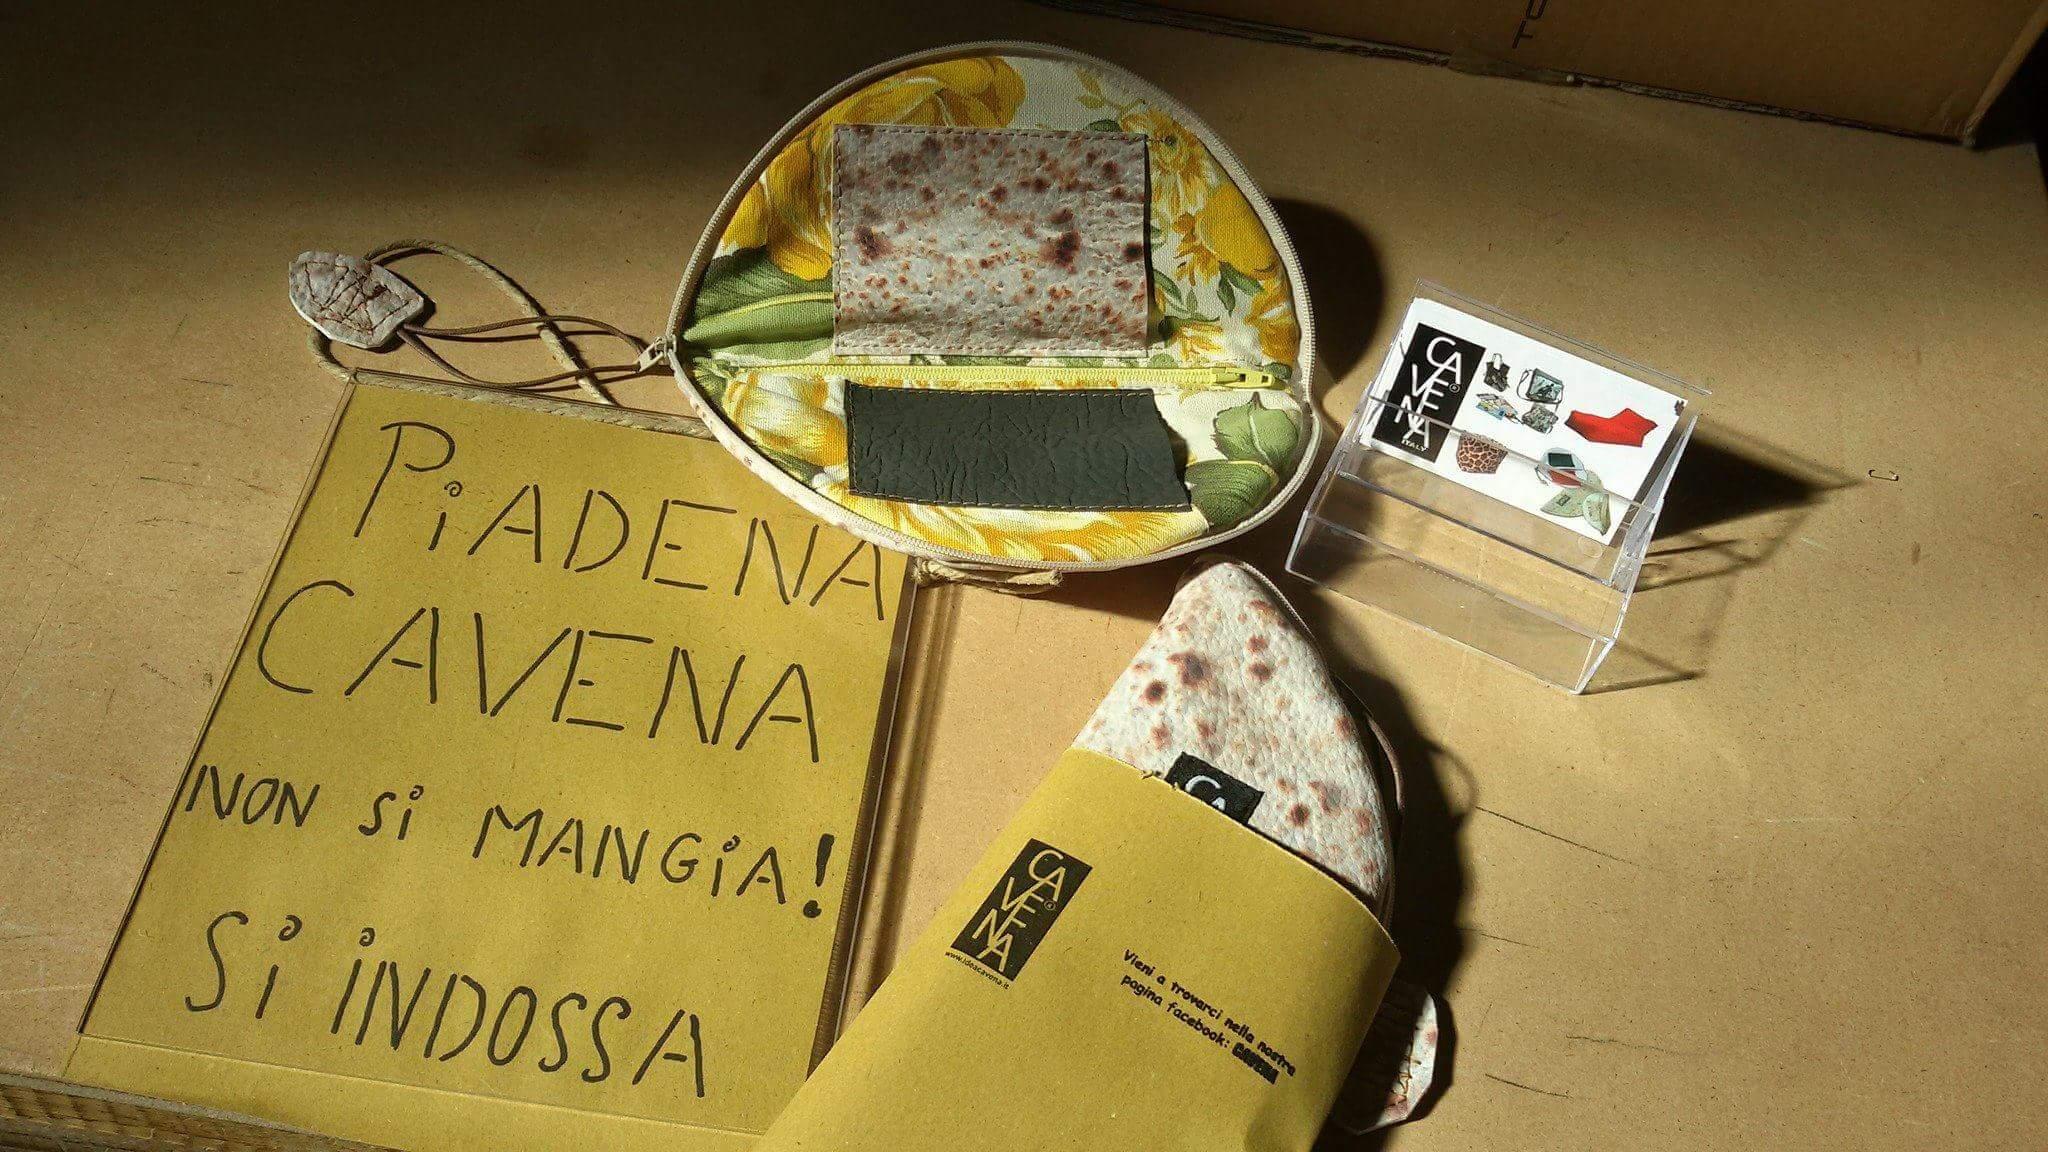 Piadina_CAVENA_01